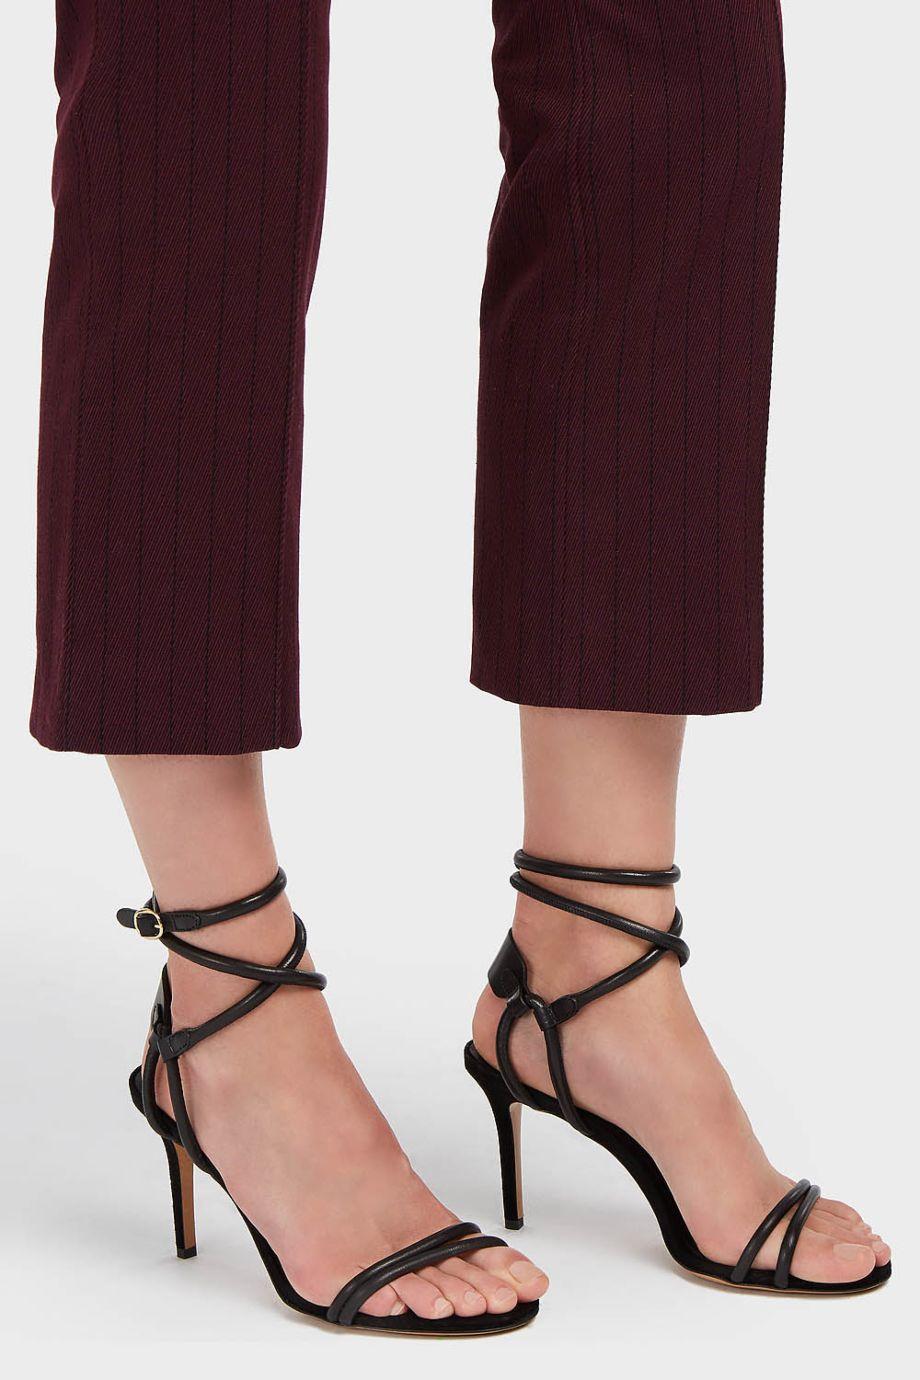 Isabel Marant Aoda leather sandals